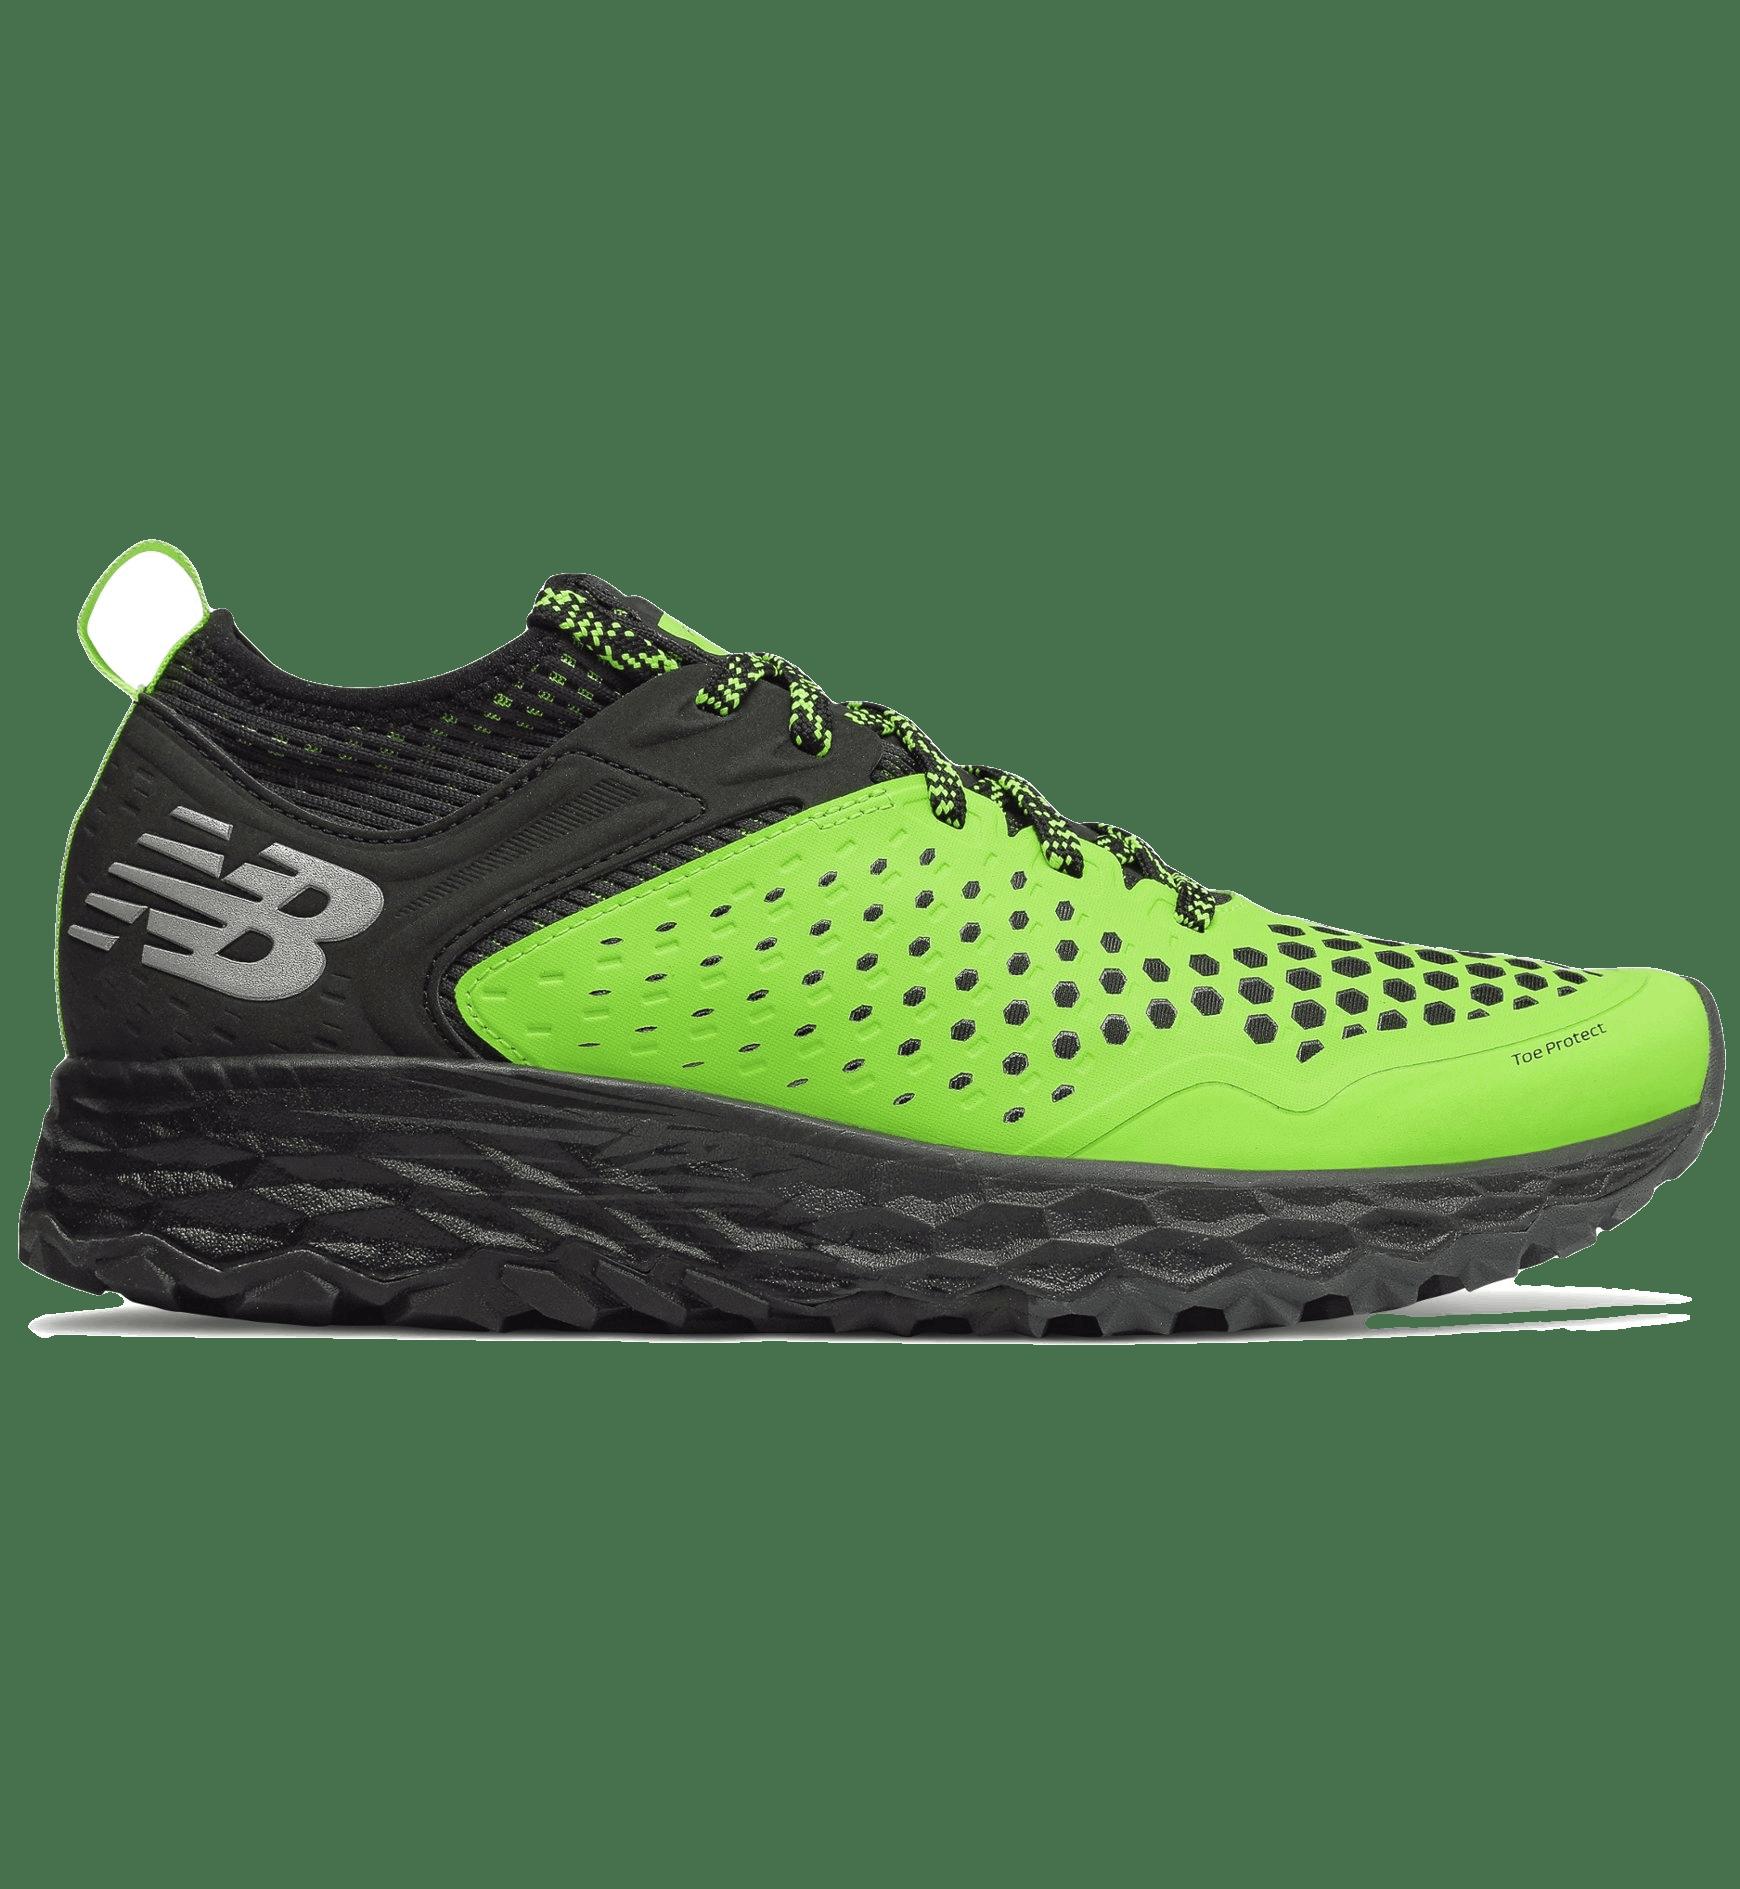 Fresh Foam Hierro v4 New Balance Scarpe trail running Modello da uomo